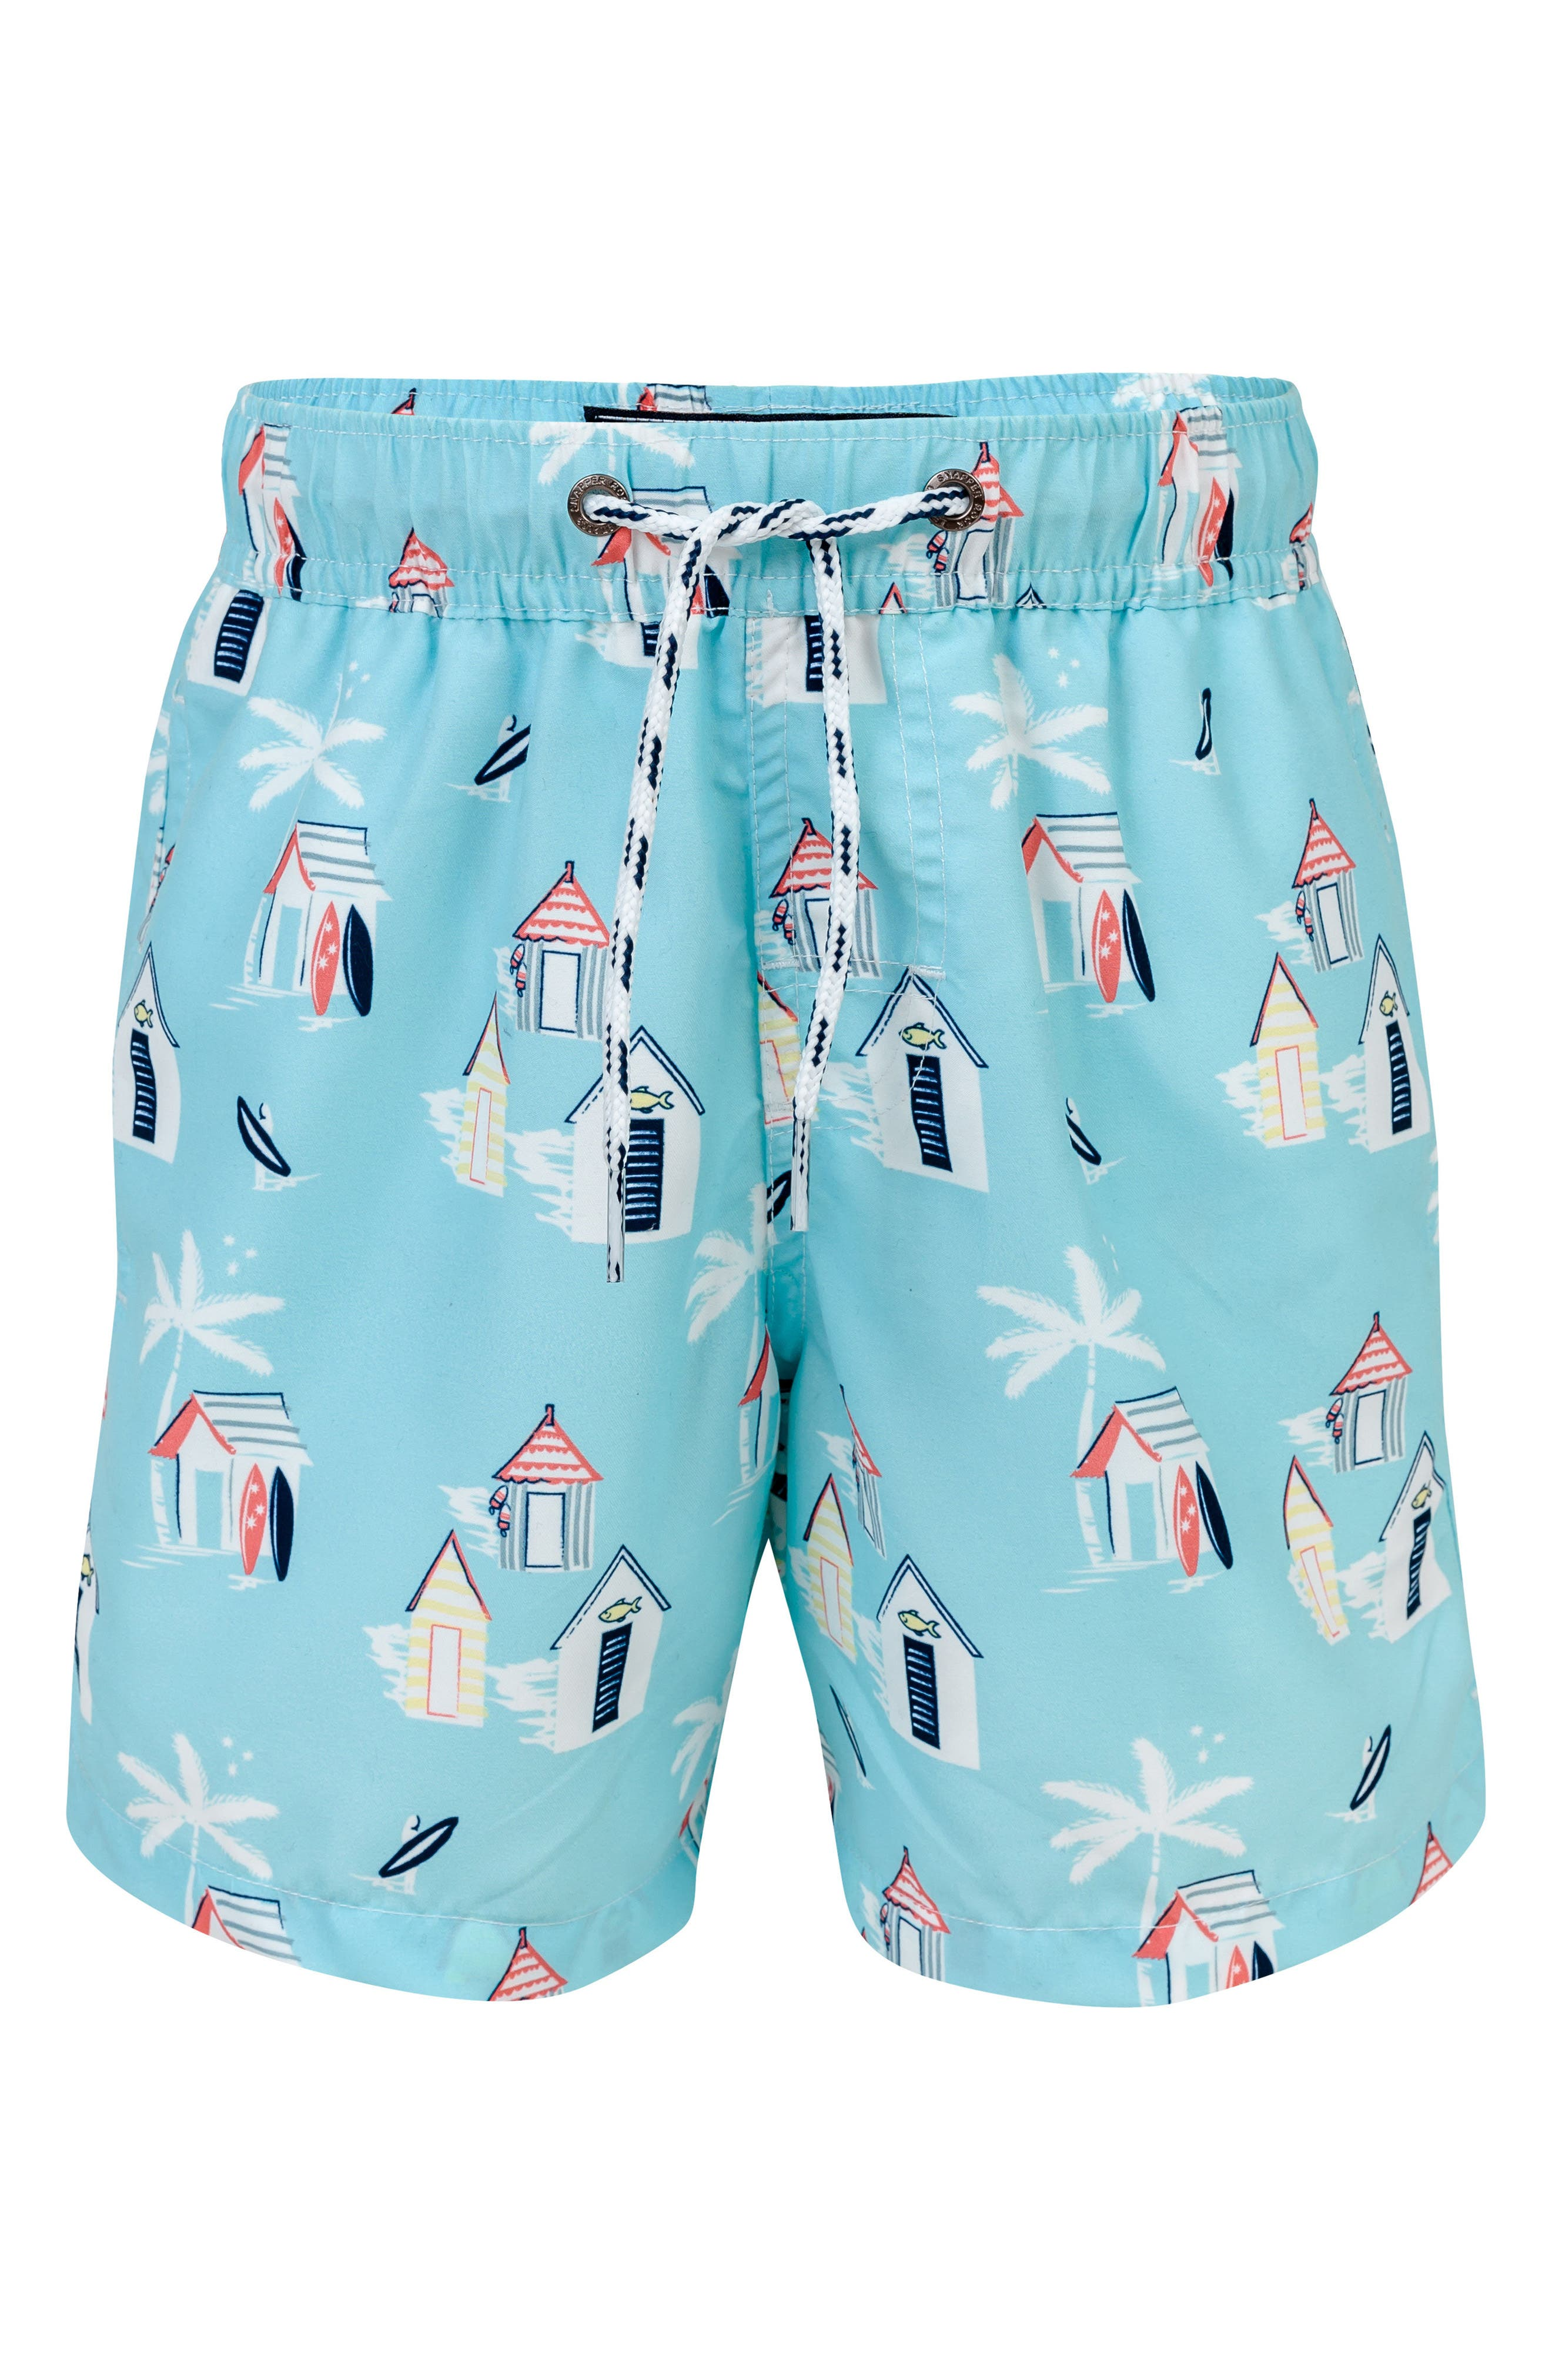 Cabana Palm Board Shorts,                         Main,                         color, LIGHT BLUE MULTI